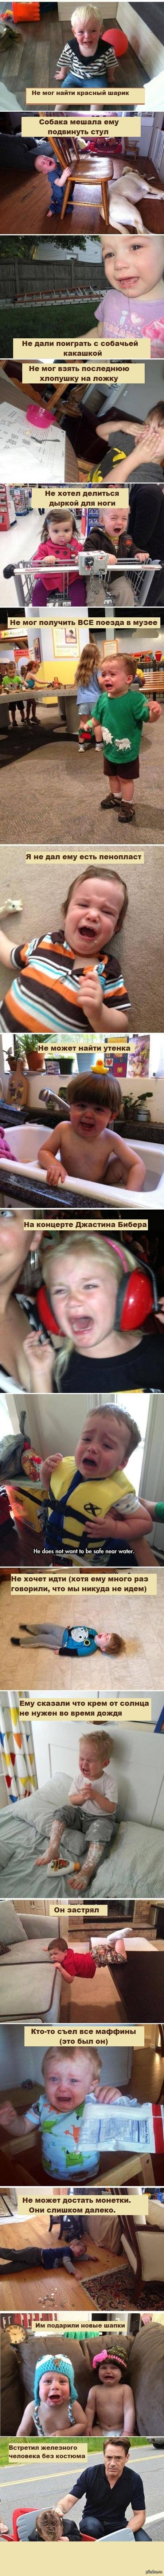 http://s5.pikabu.ru/post_img/2014/04/12/11/1397323468_1437663301.jpg